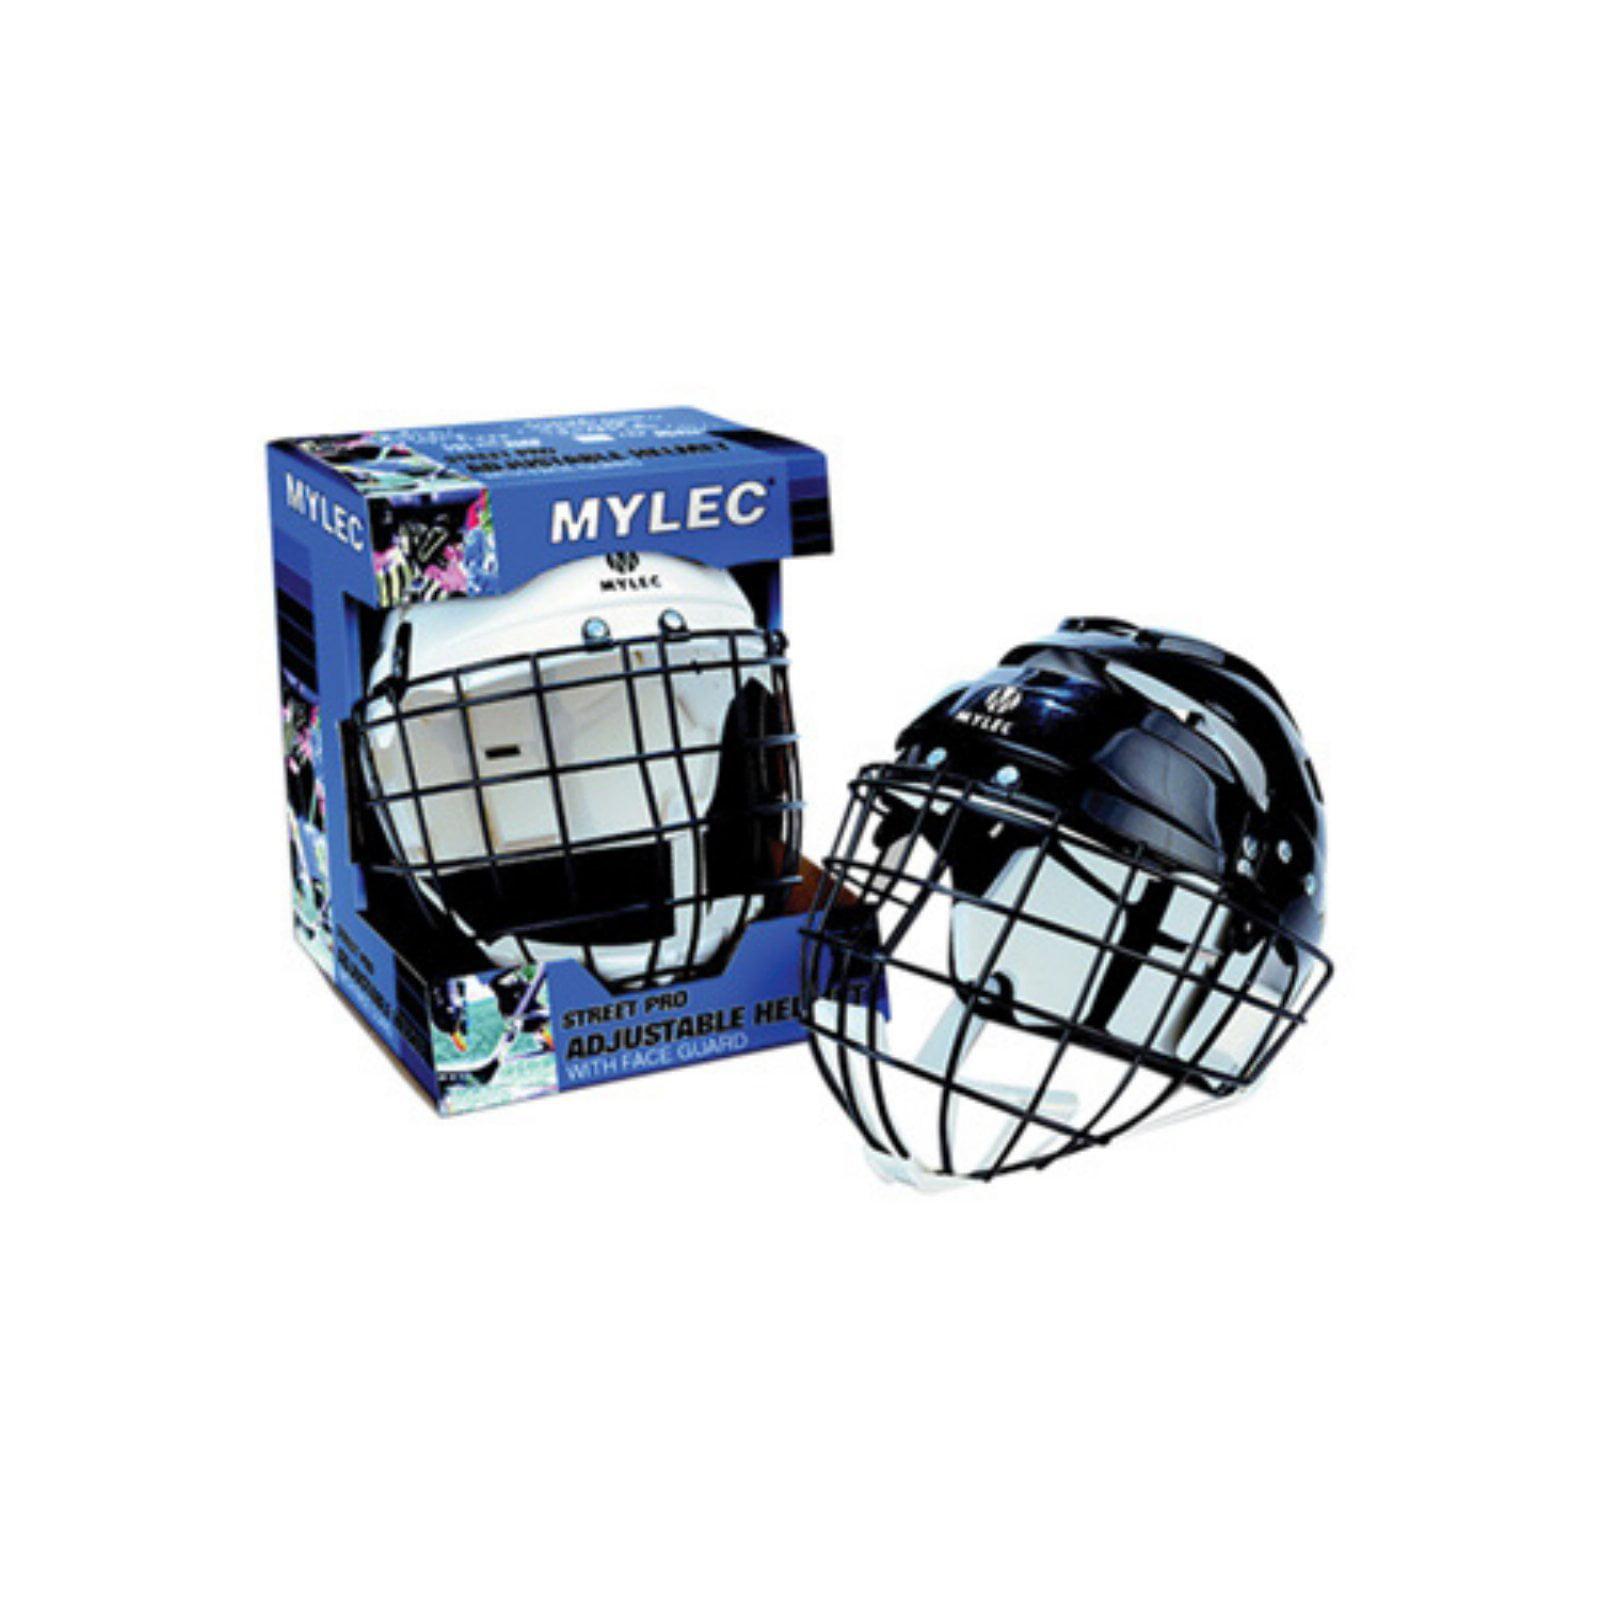 Mylec 0151 Senior Helmet with Wire Face Cage by Mylec